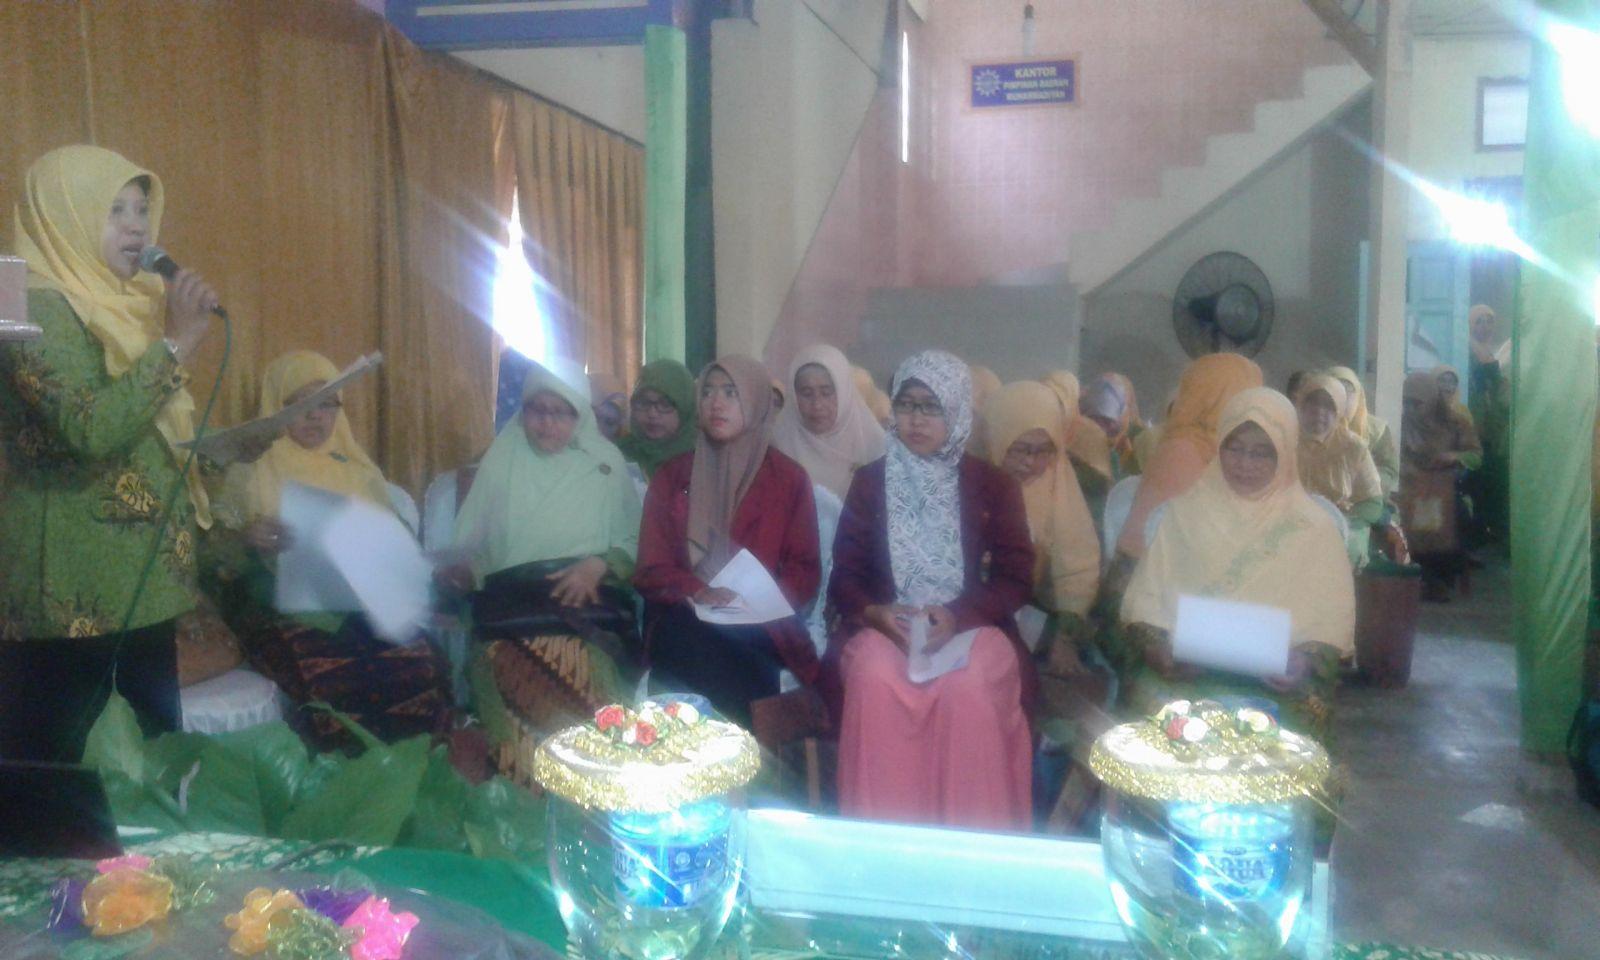 Pimpinan Wilayah 'Aisyiyah Lampung Periode 2015-2020